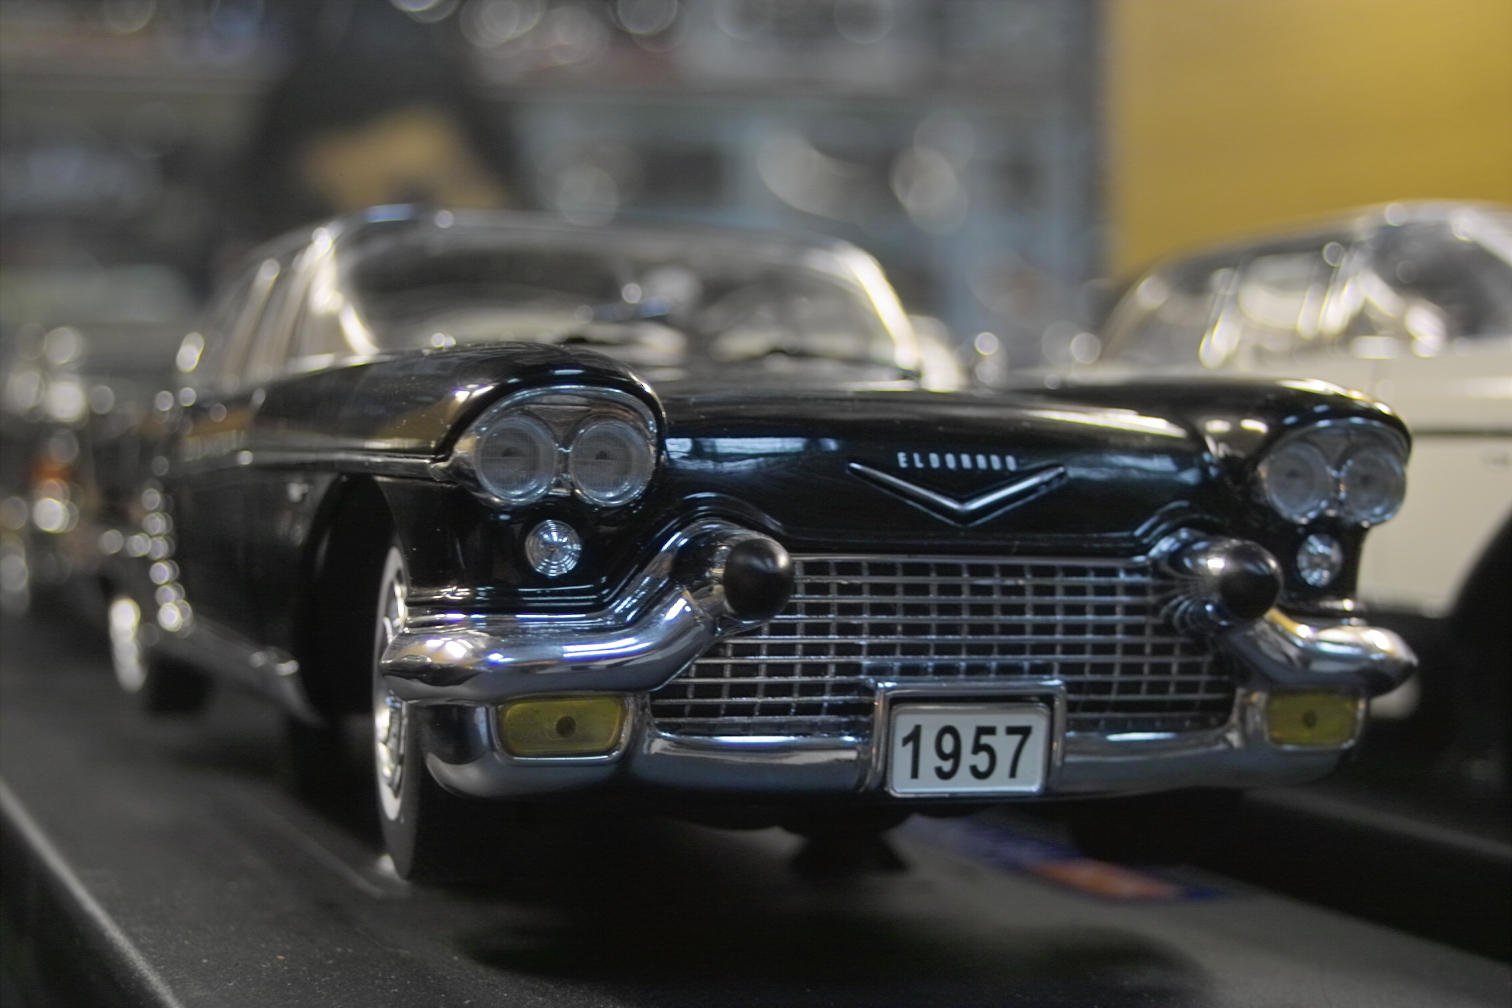 old school car model by gaddar on DeviantArt